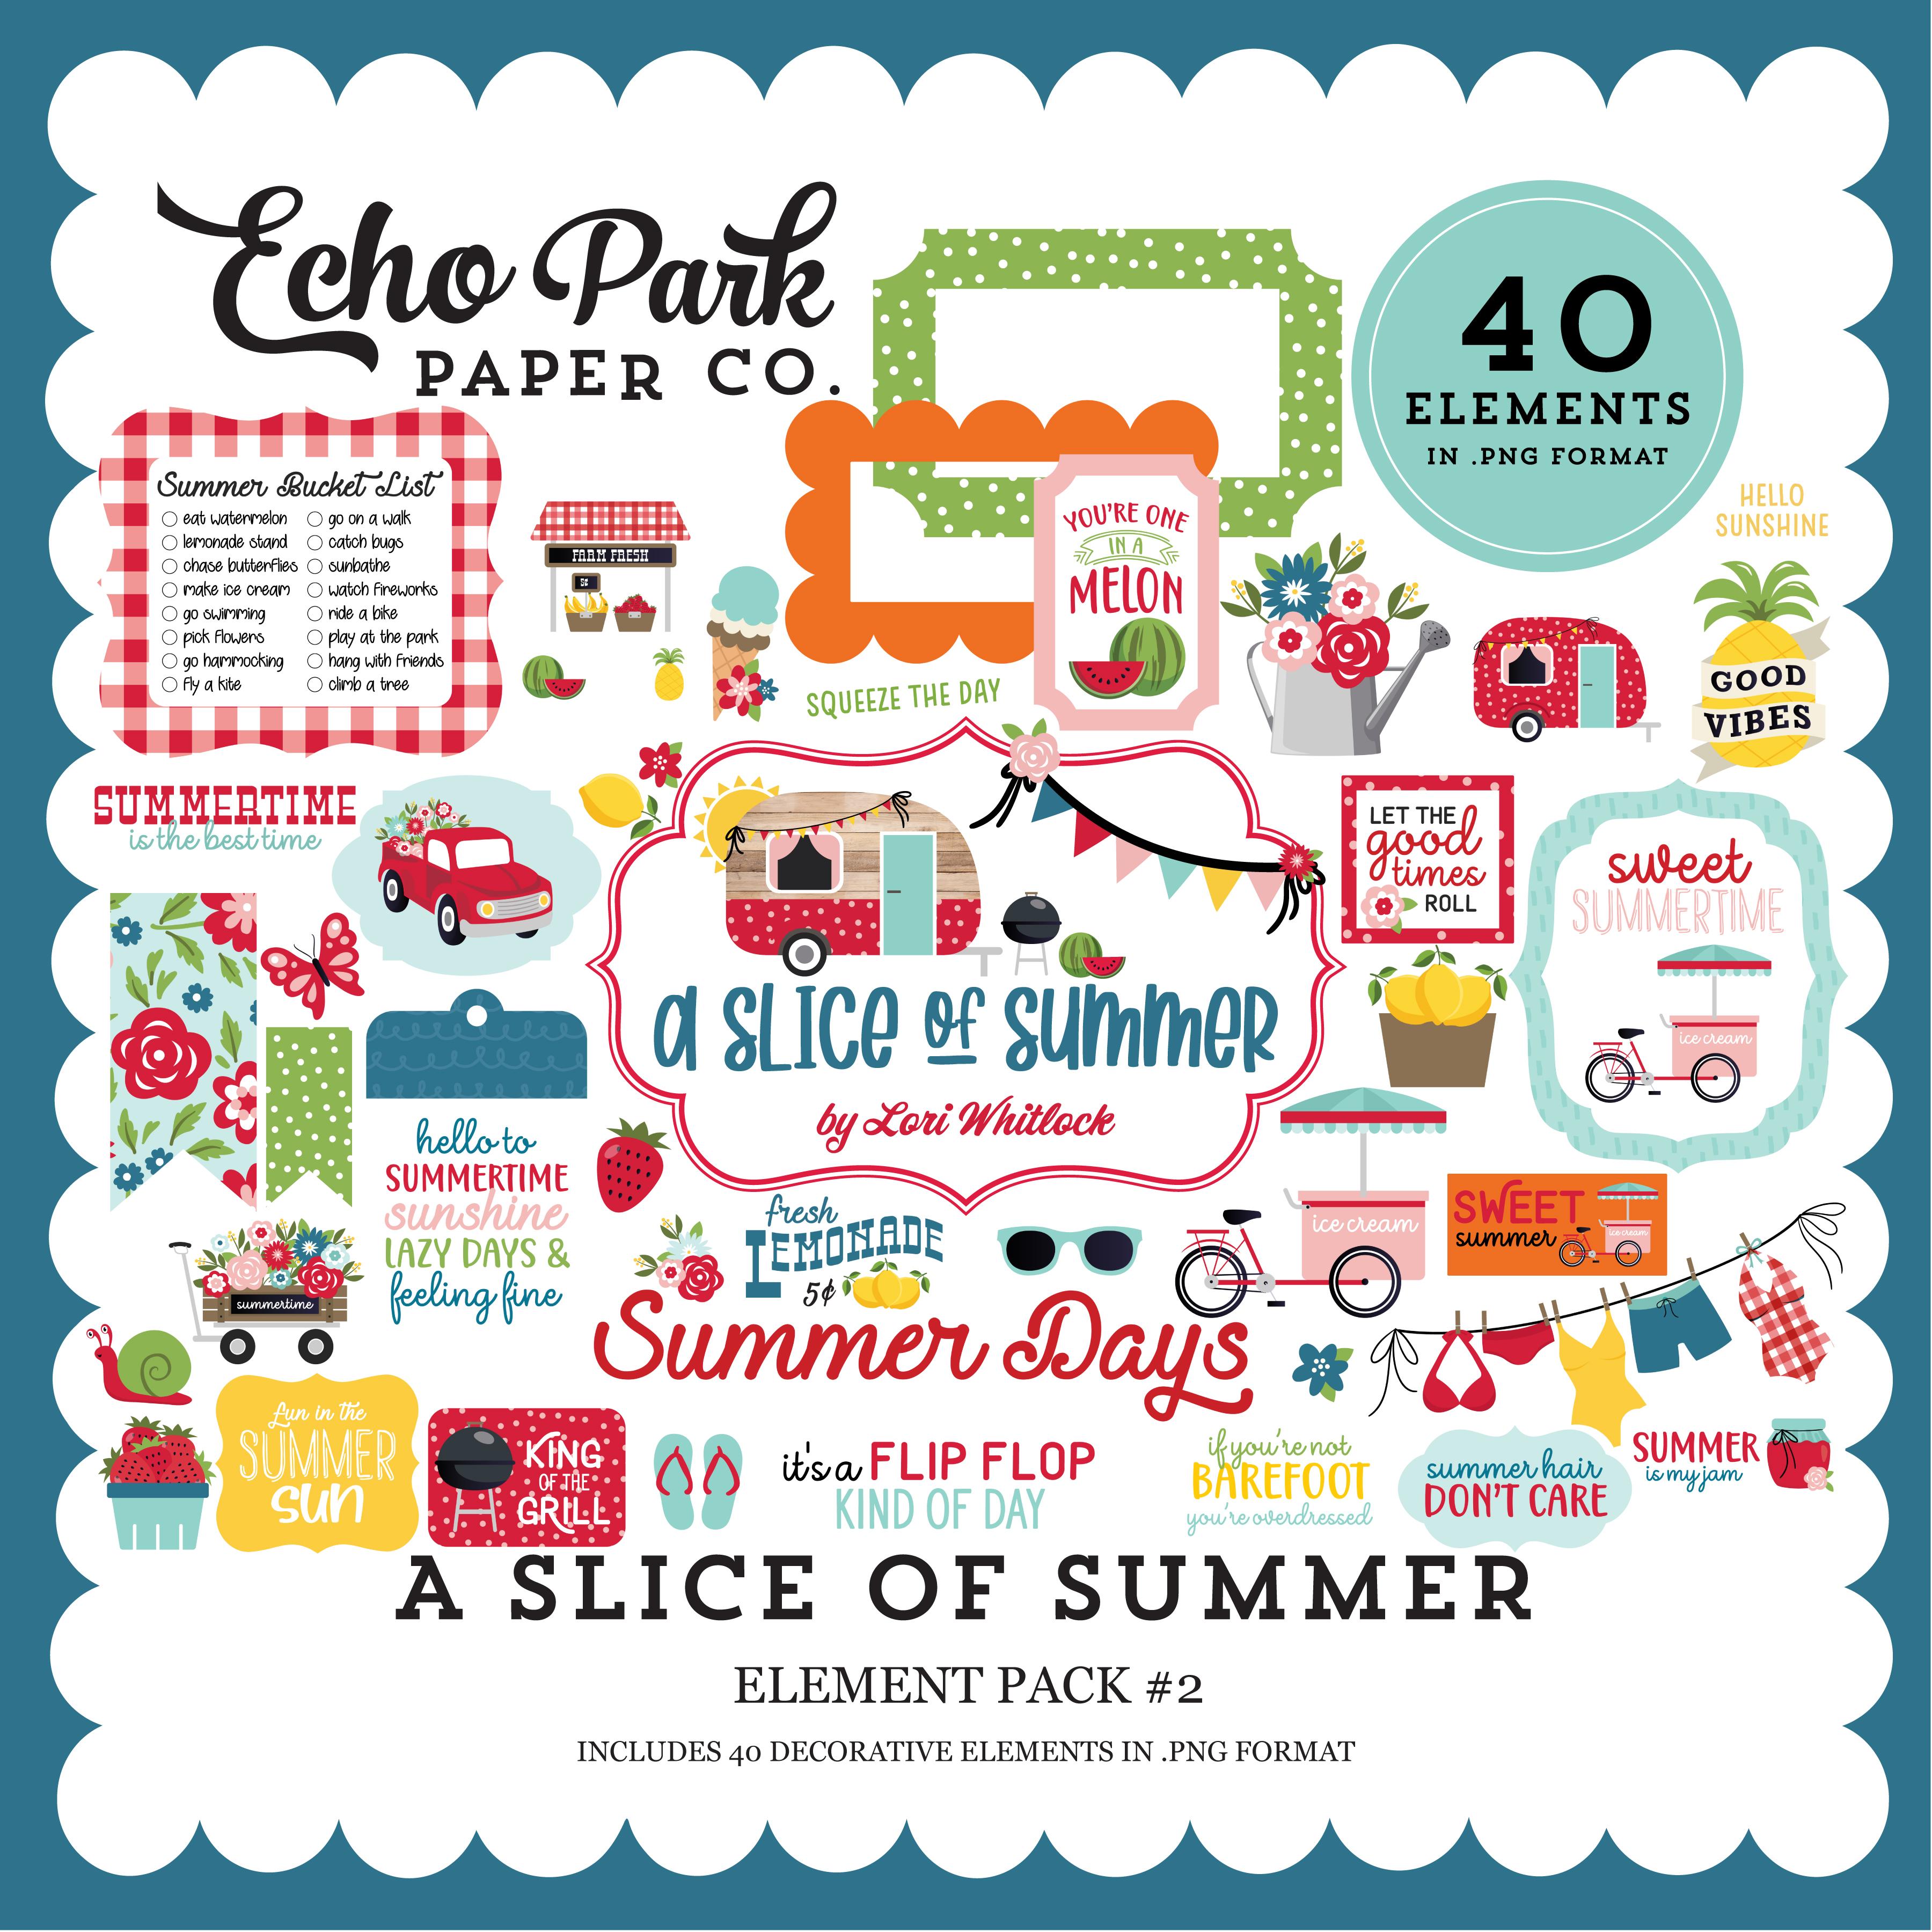 A Slice of Summer Element Pack #2